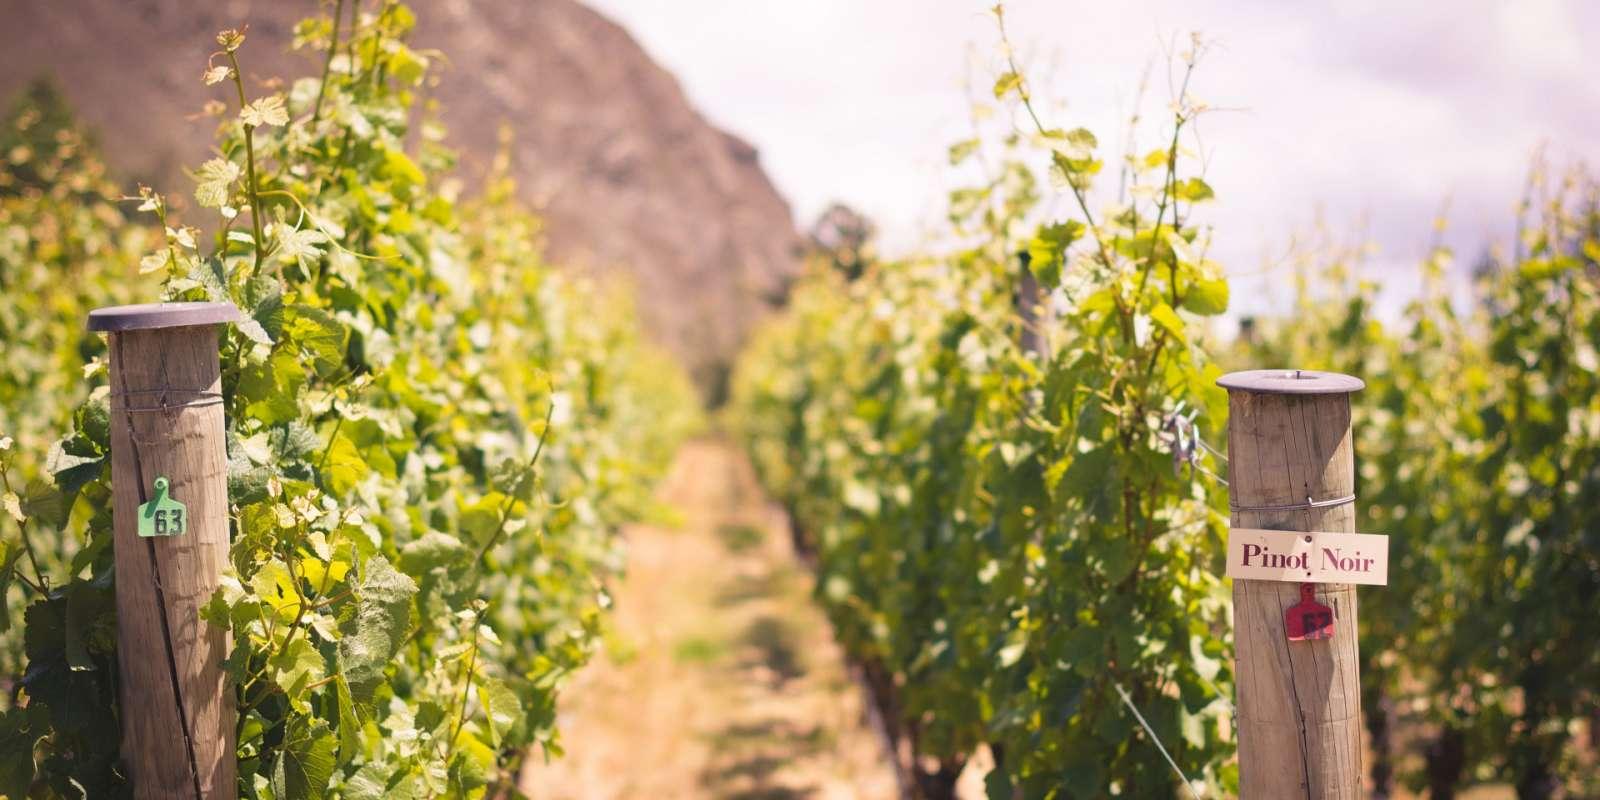 Gibbston Valley Winery Homeblock Pinot Noir Vines